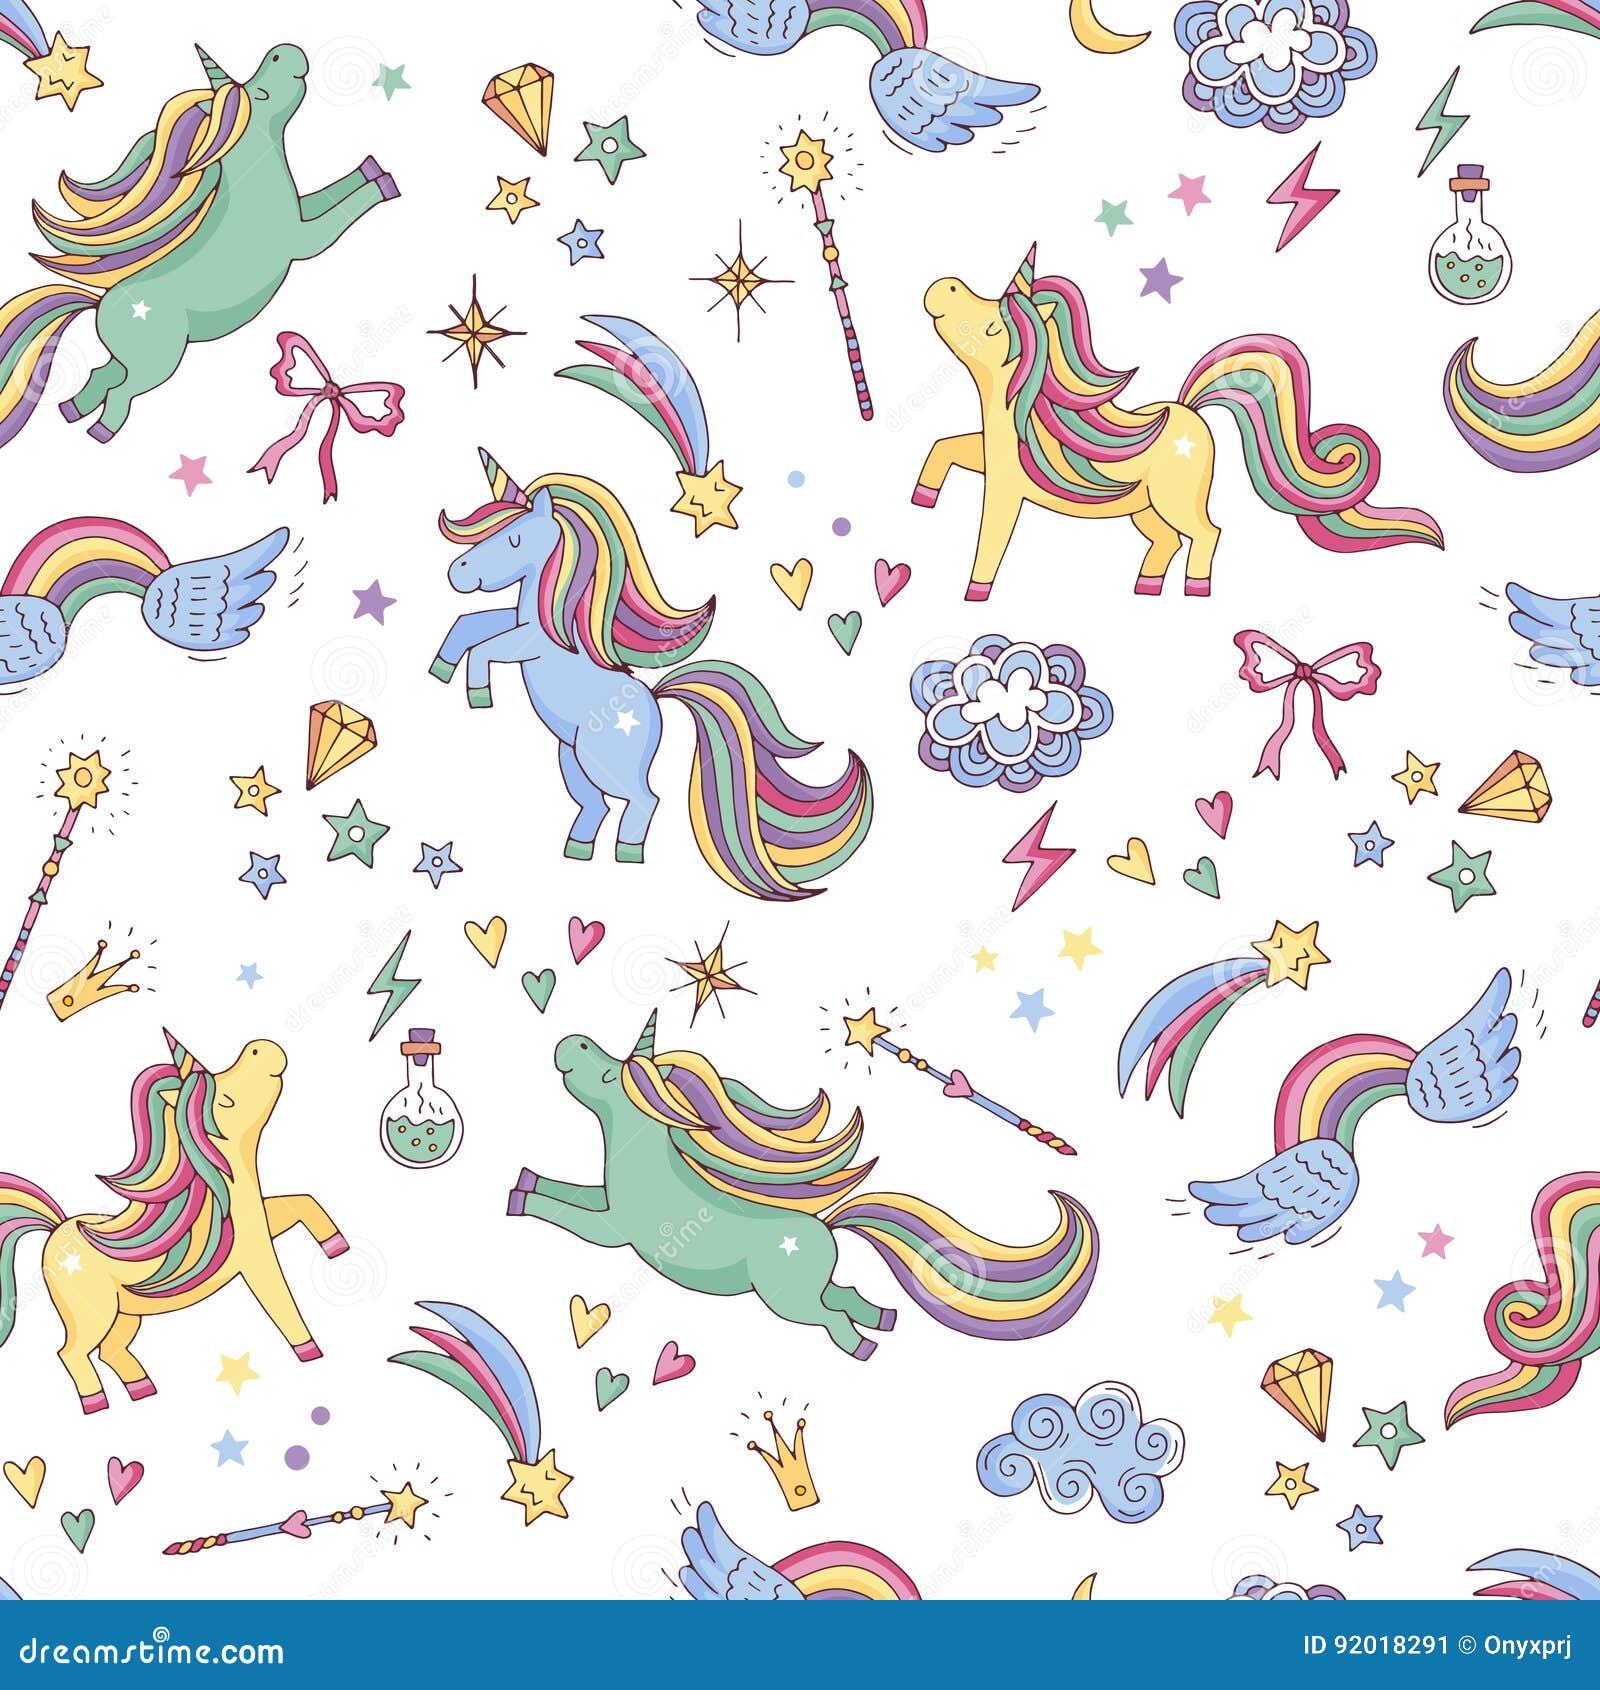 Bedroom Background Stickers